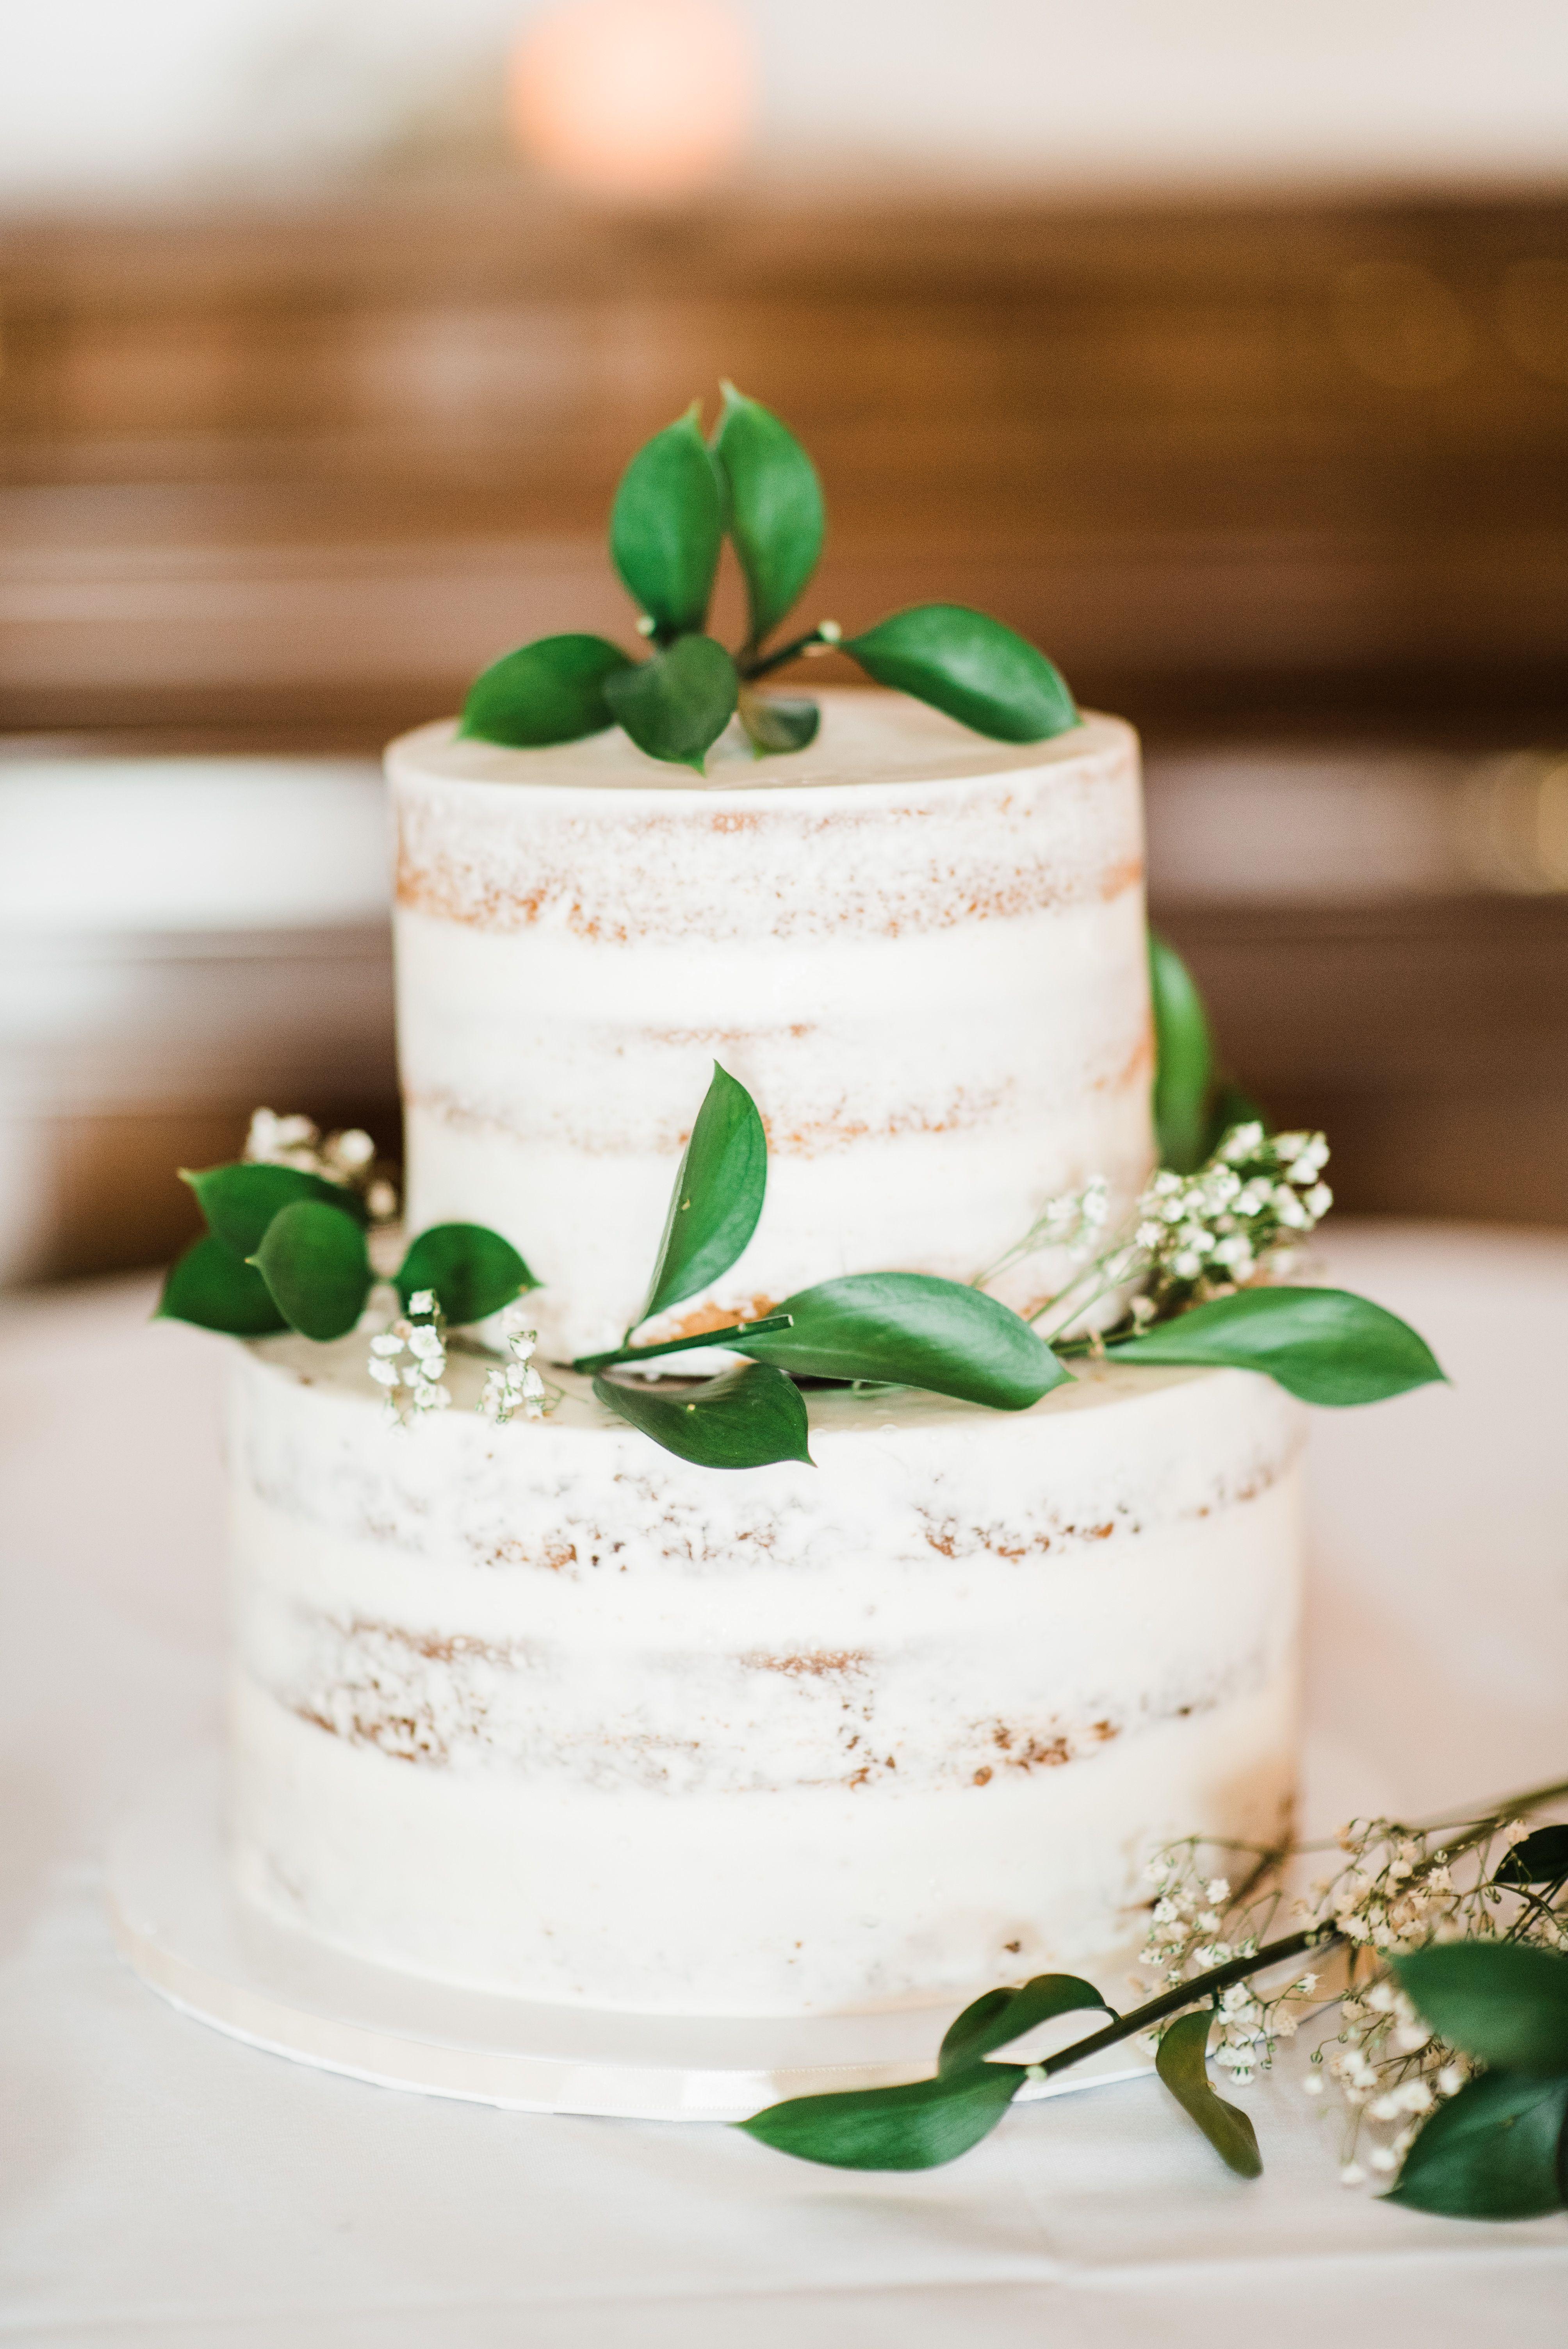 Pin on Unique Wedding Cakes, Desserts + Alternatives